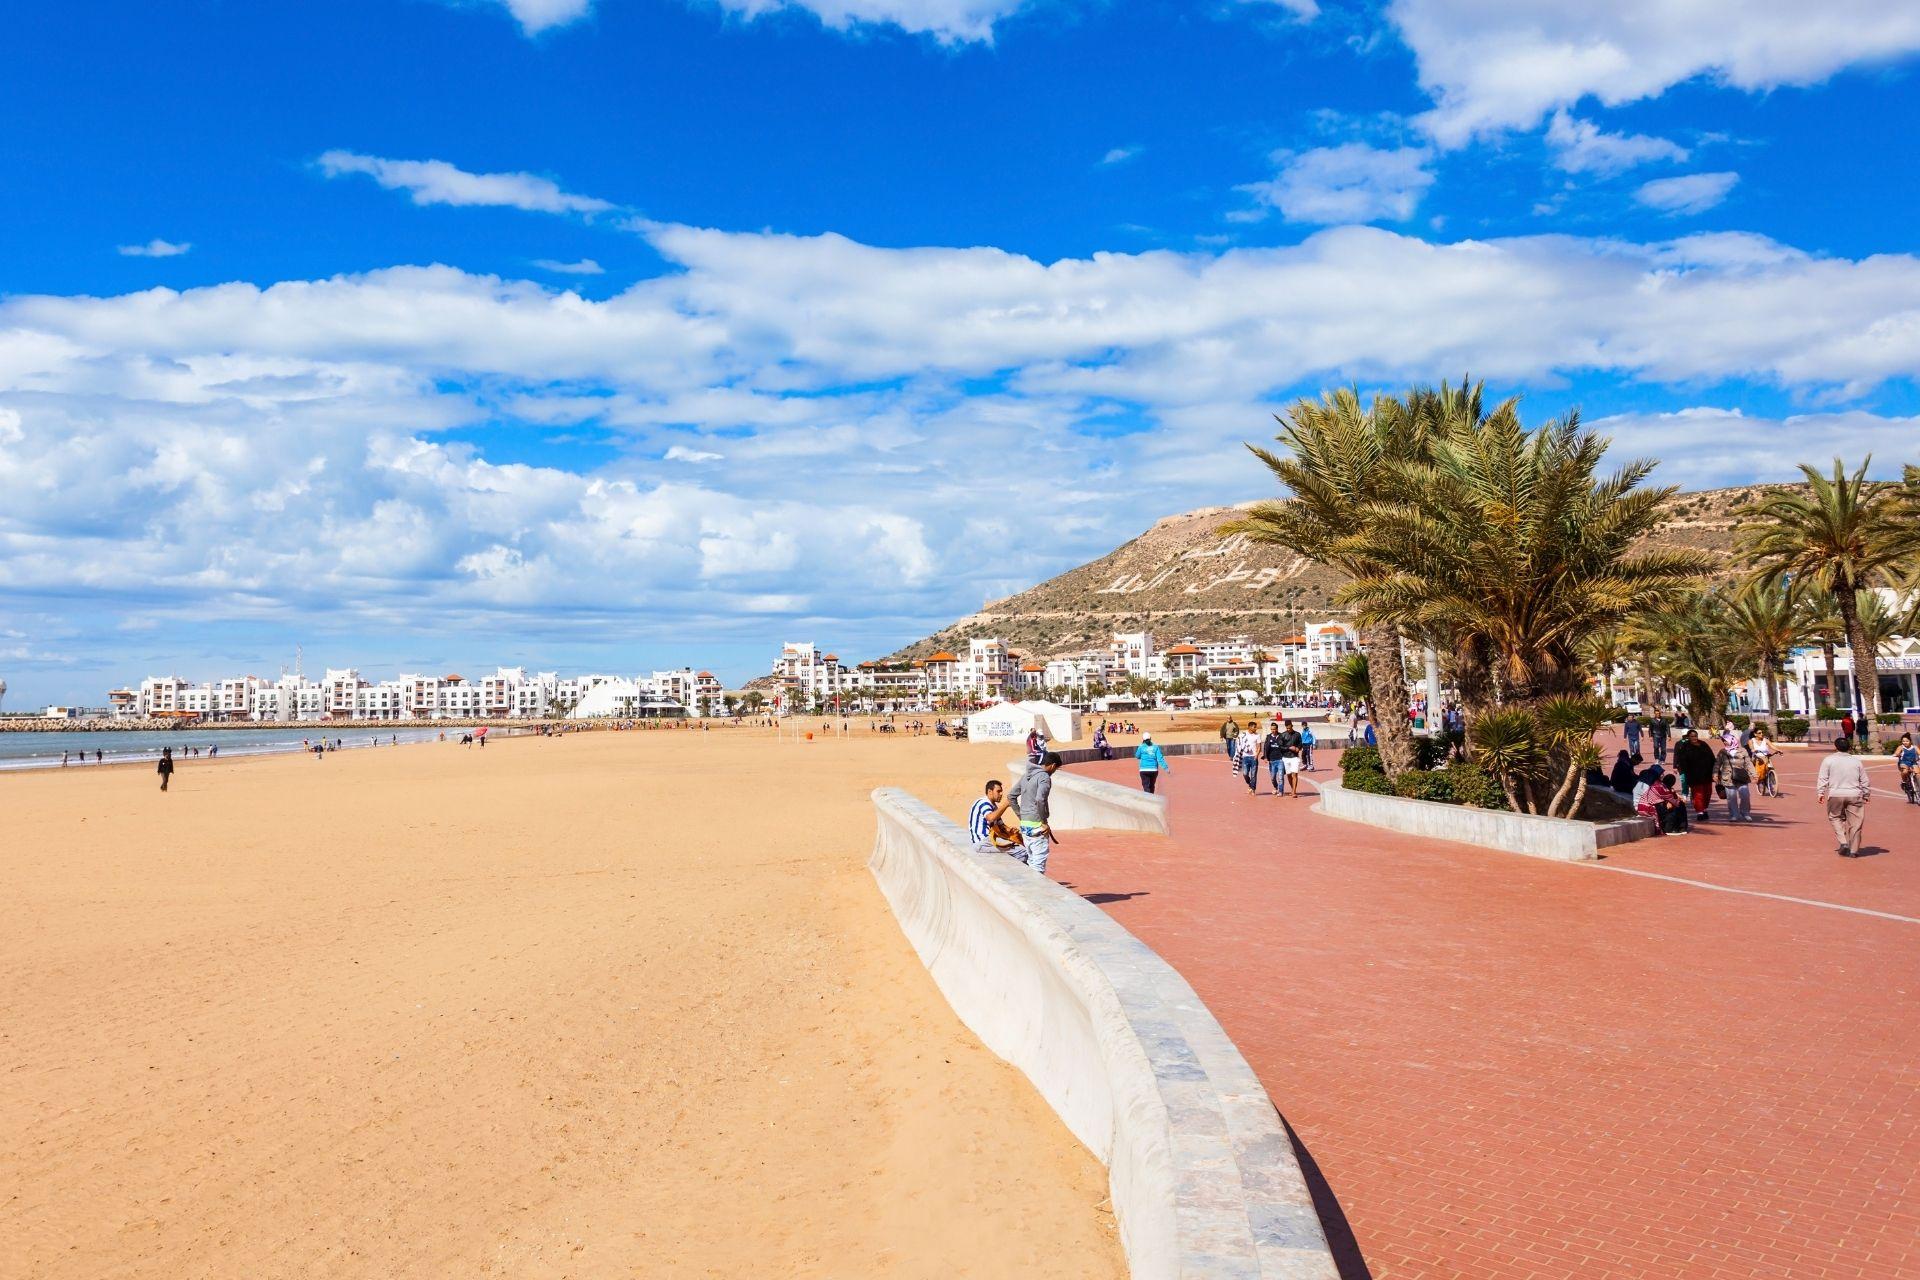 Popular hotels in Agadir